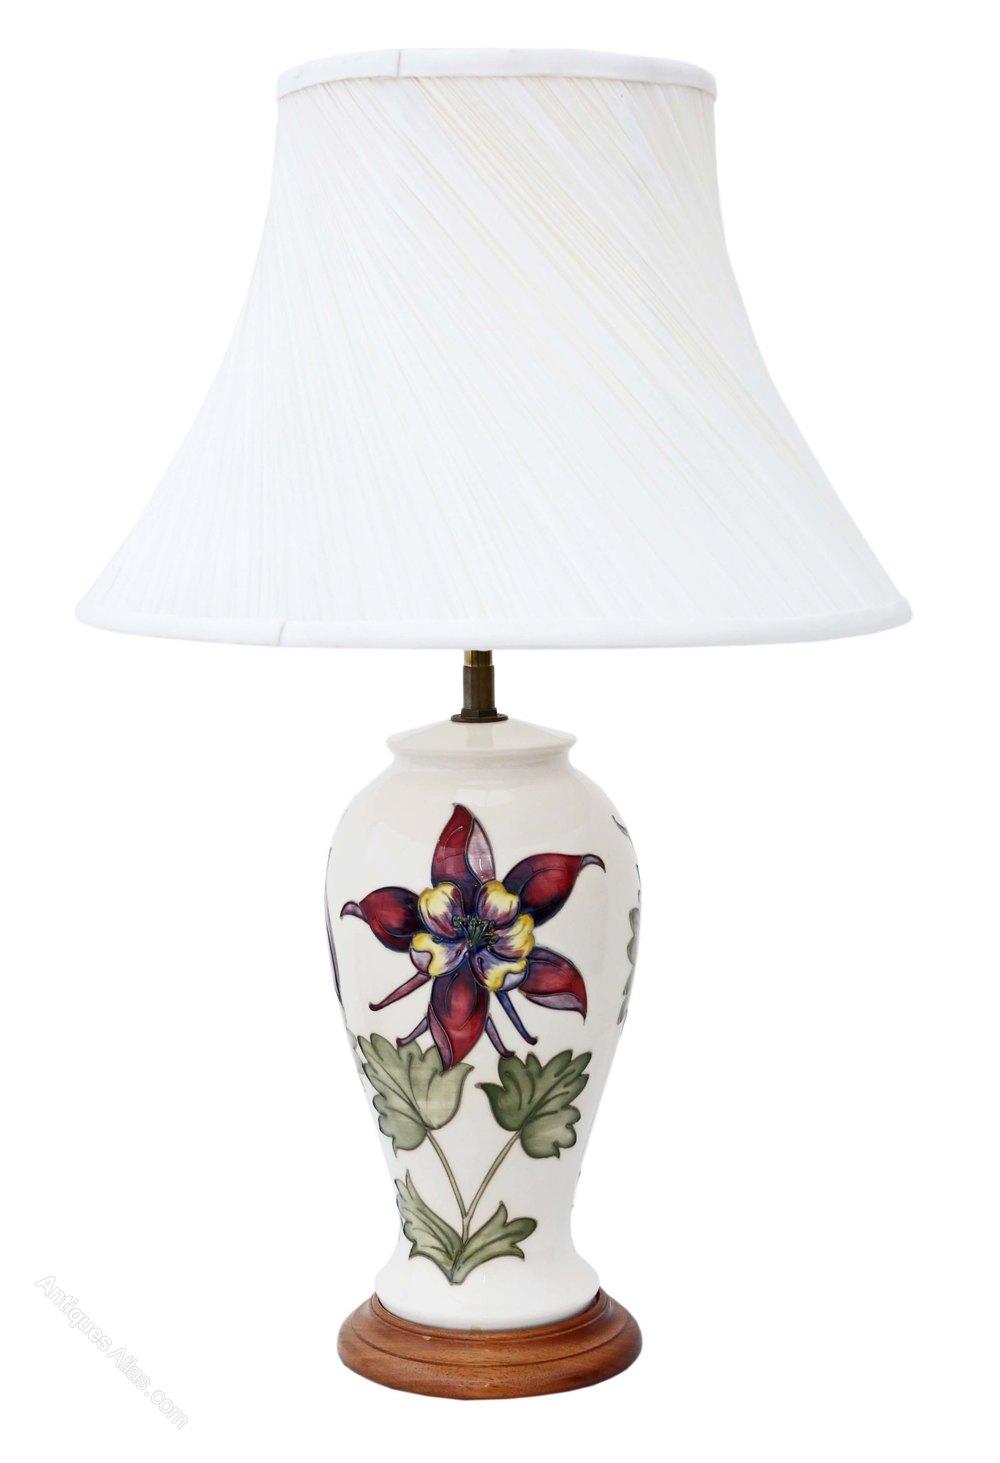 Antiques atlas moorcroft ceramic table lamp with shade table lamps moorcroft ceramic table alt5 alt6 aloadofball Choice Image